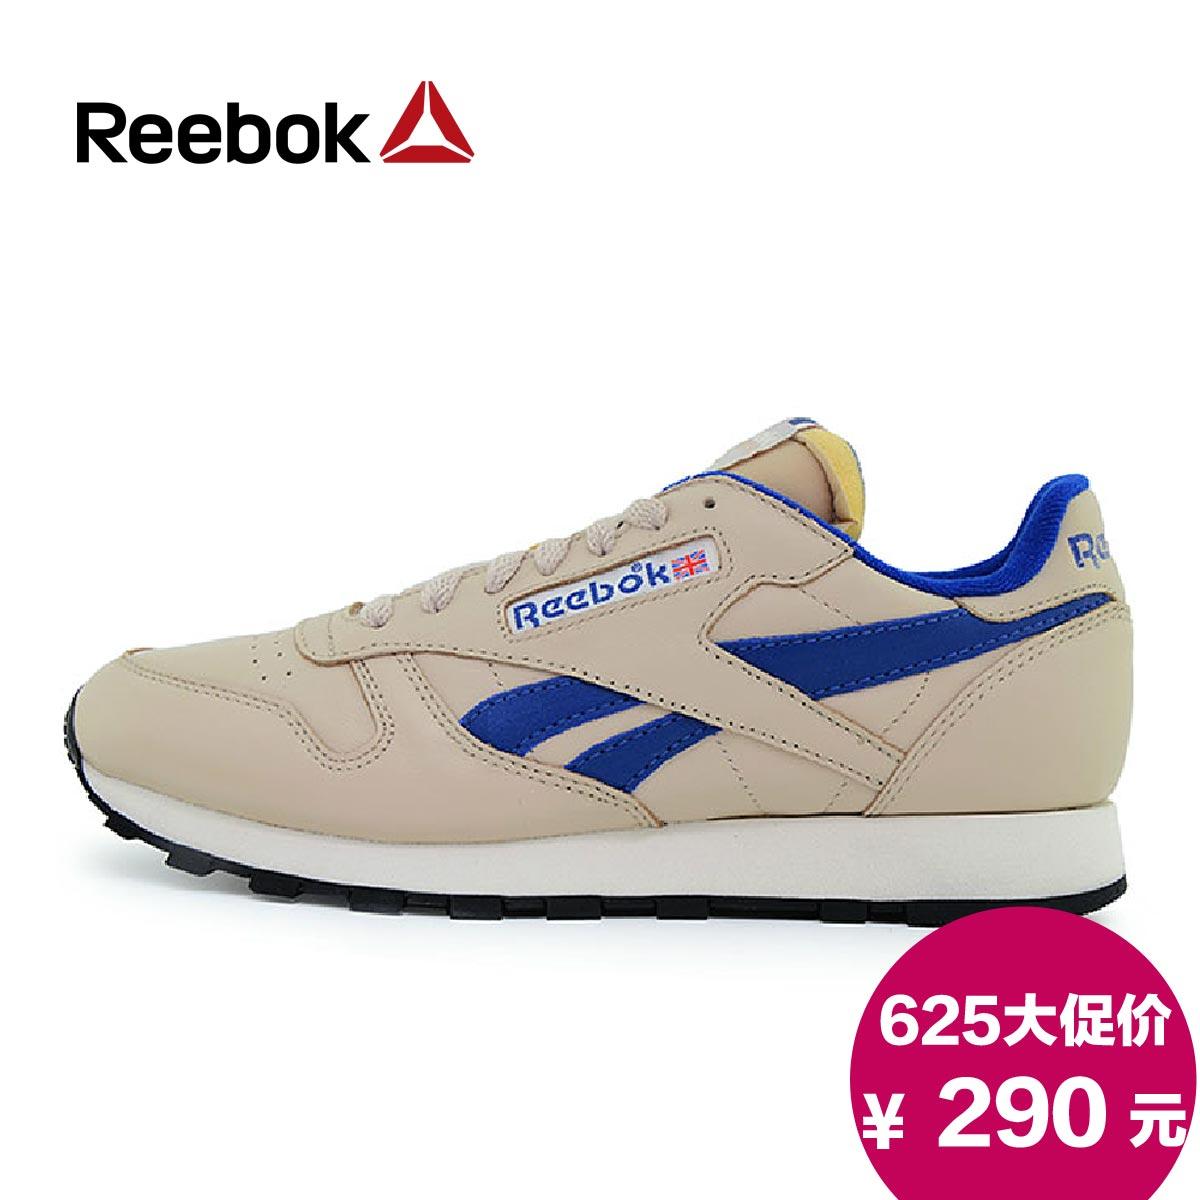 кроссовки Reebok CL Leather NV740 кроссовки reebok кроссовки cl leather solids